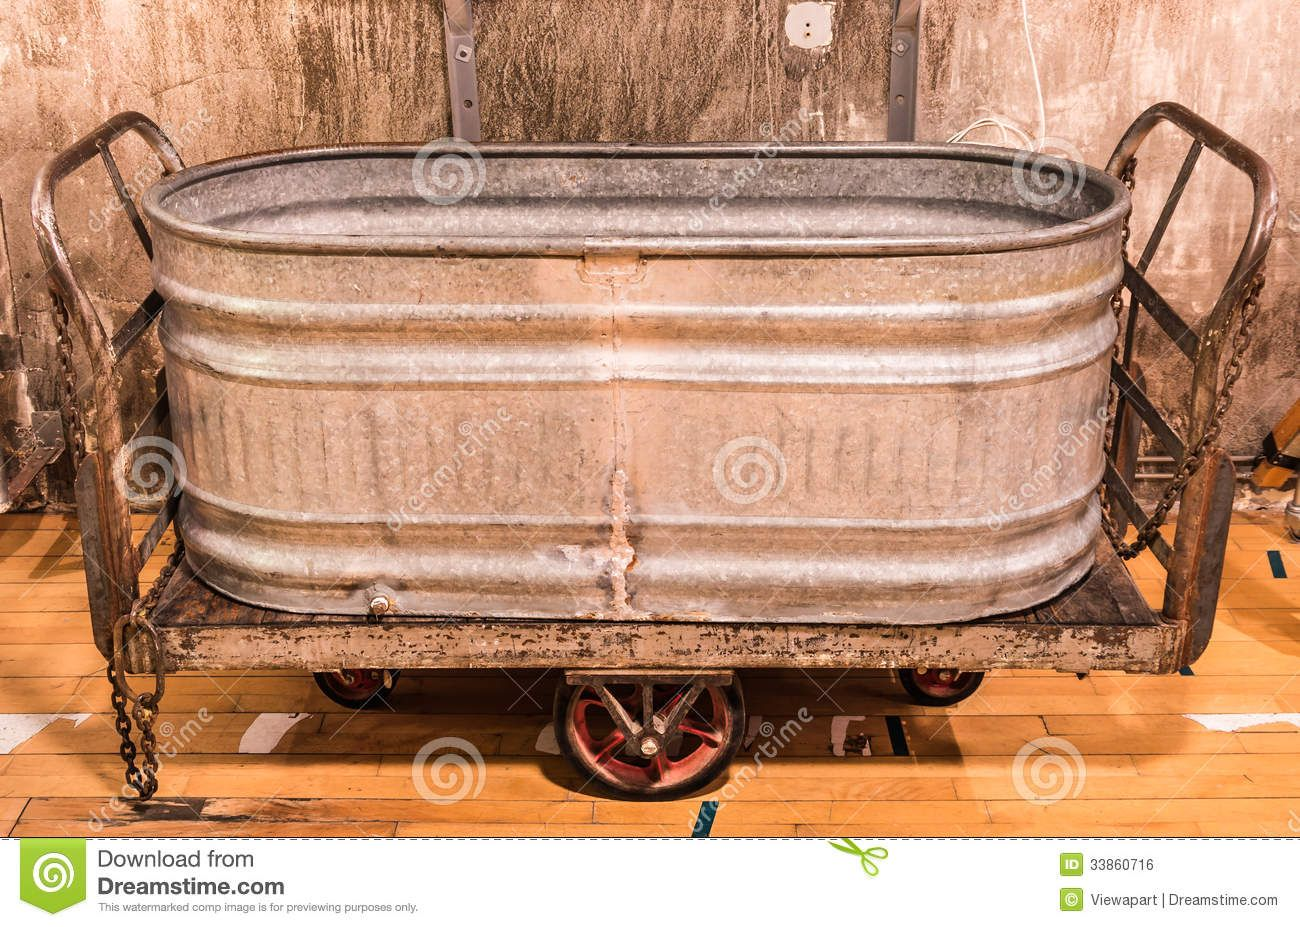 bathtub vintage - Google Search